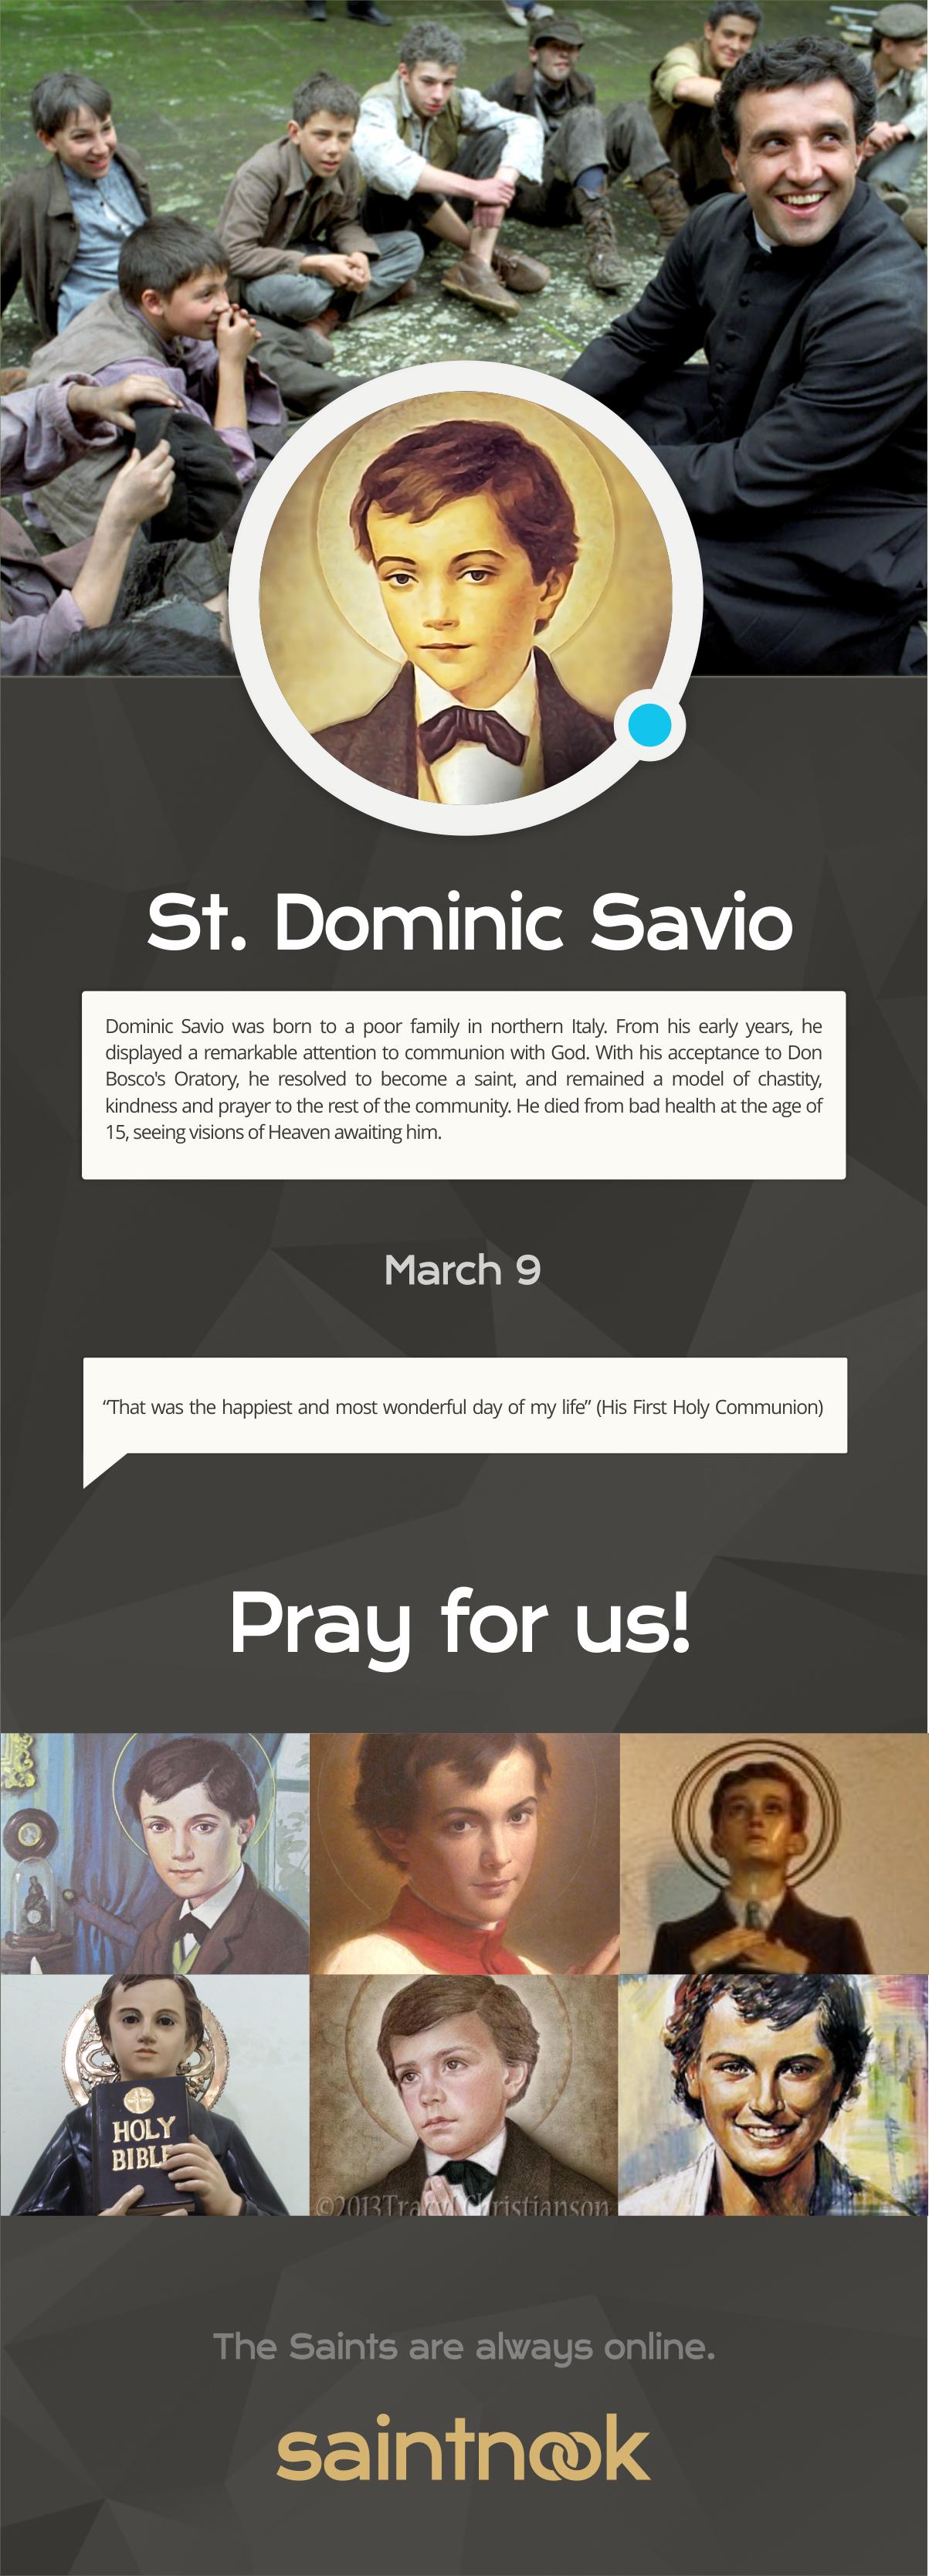 St Dominic Savio | www.saintnook.com/saints/dominicsavio